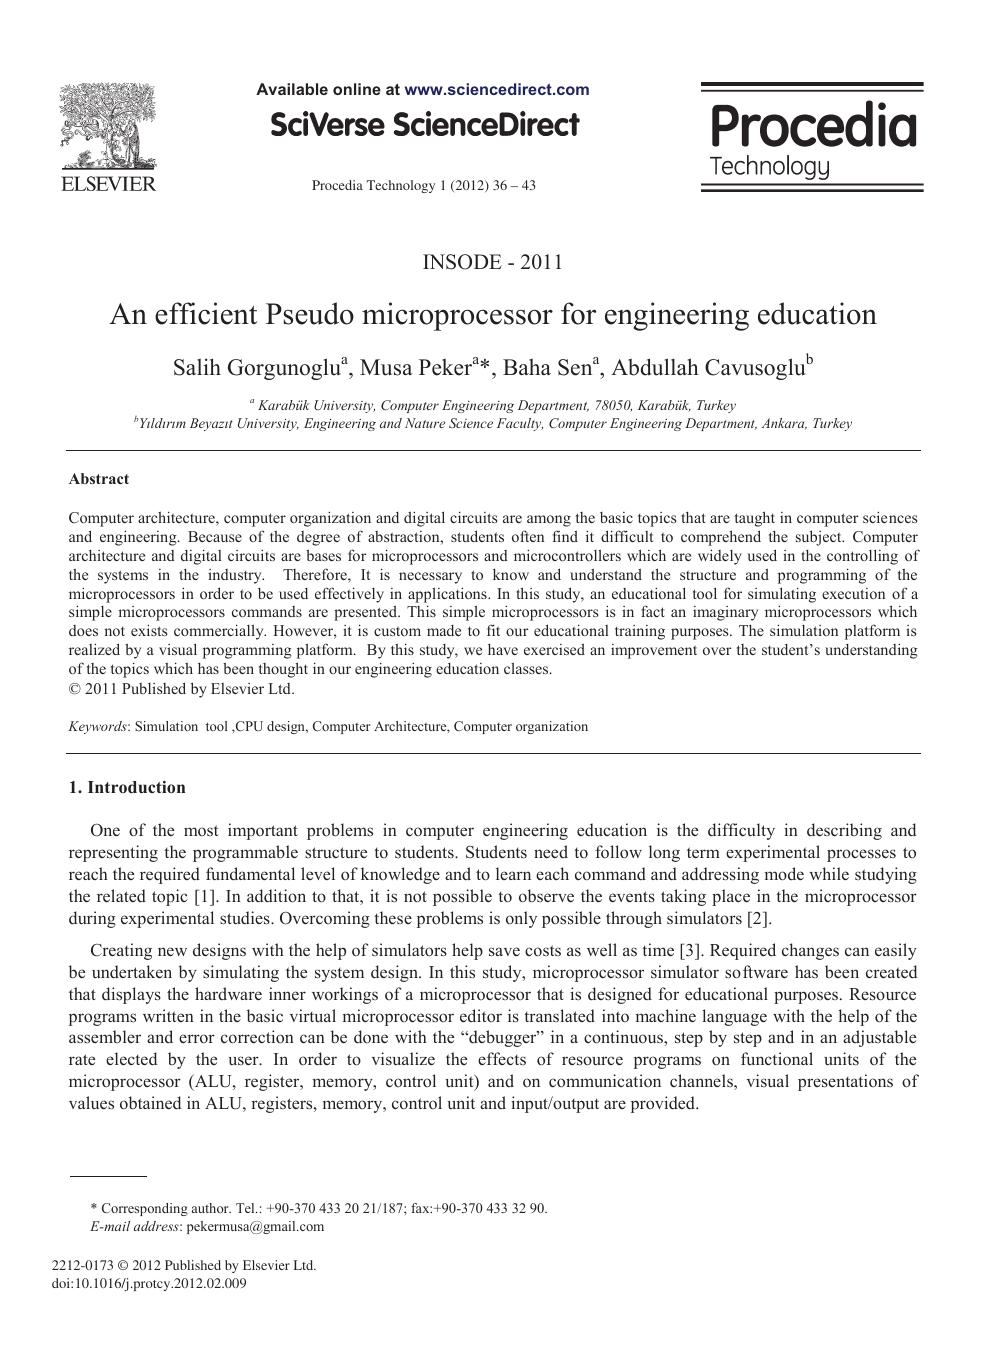 define computer organization and architecture